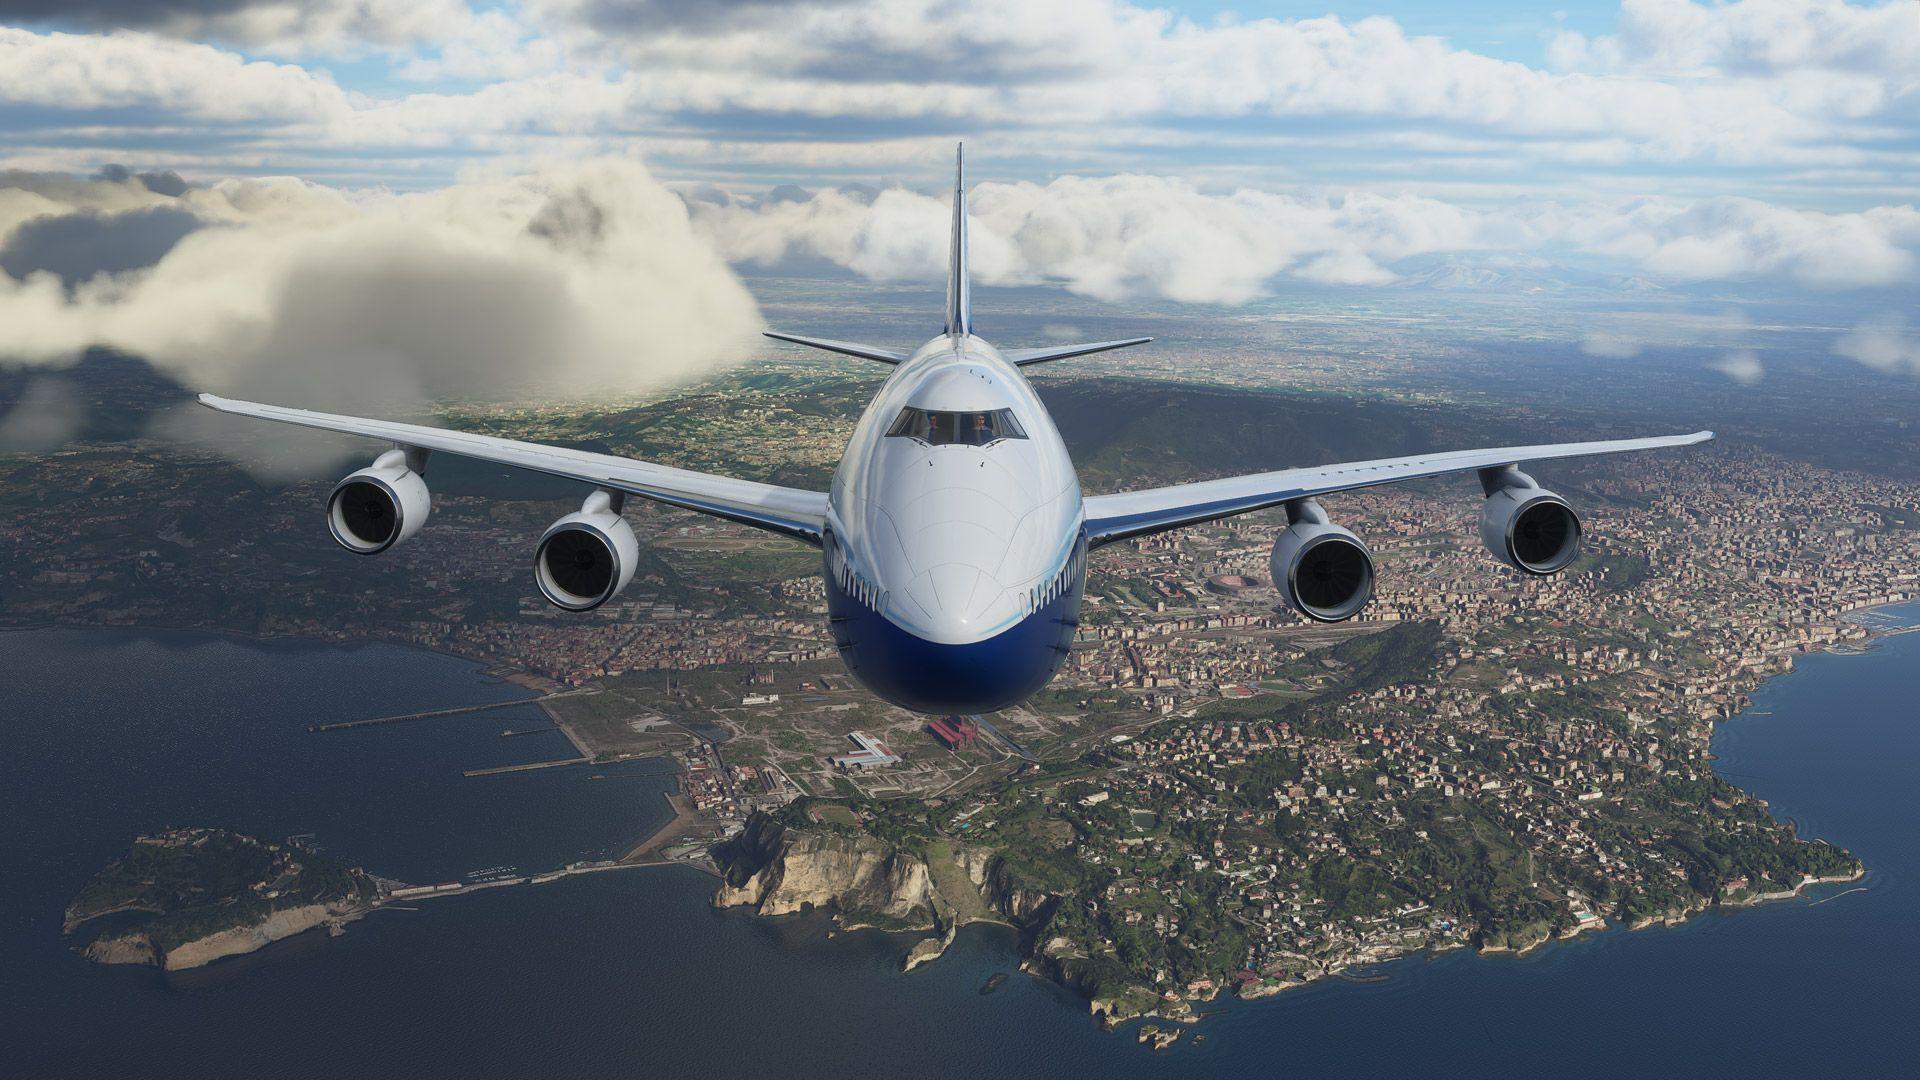 Microsoft Flight Simulator Update 1.16.2.0 Patch Details